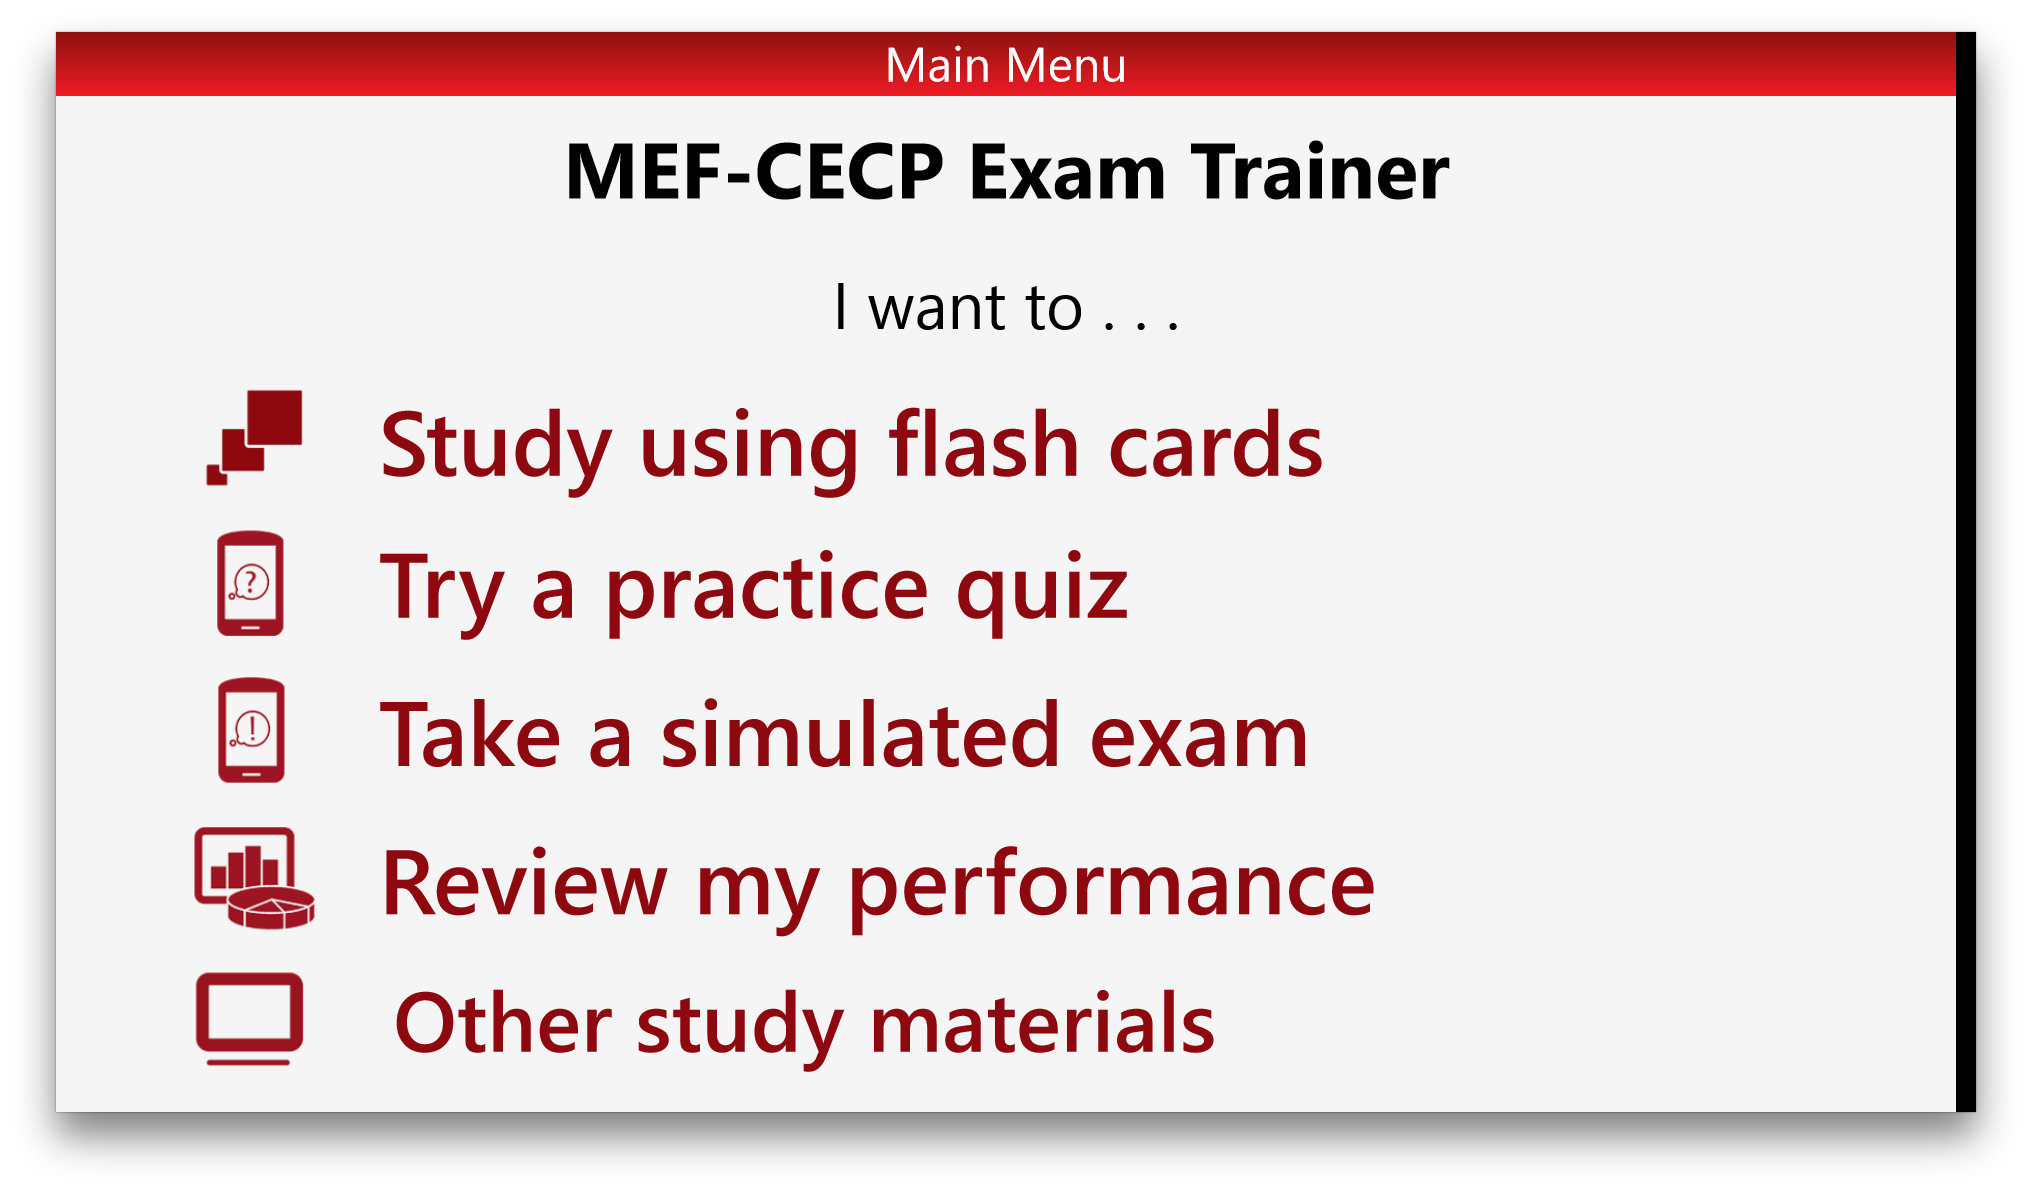 Mef cecp exam trainer blueprint c free windows phone app market prev malvernweather Choice Image